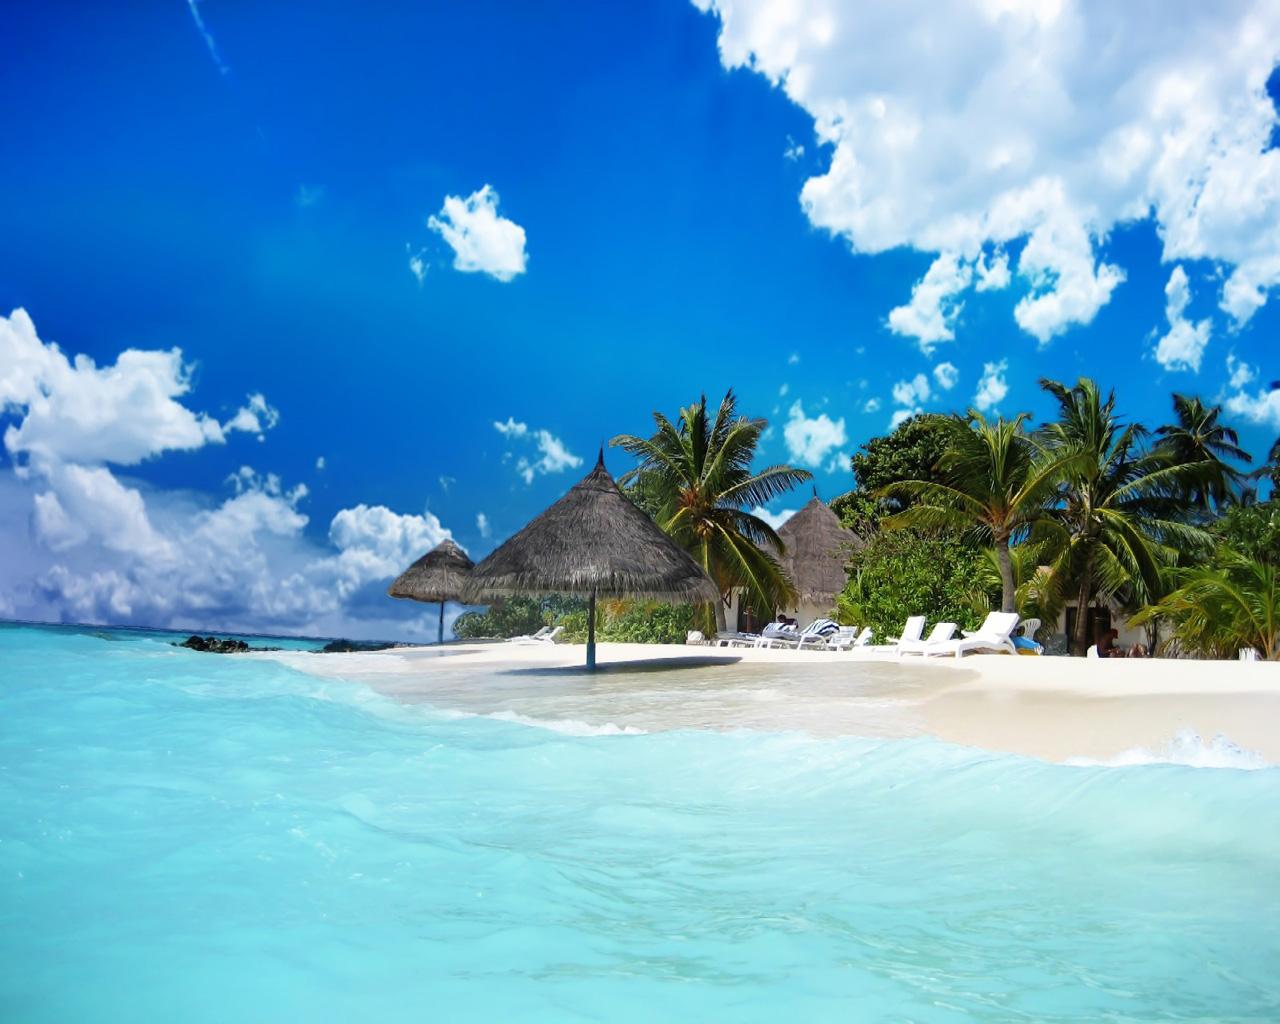 Beautiful Beaches Hd Background Wallpaper 112 HD Wallpapers